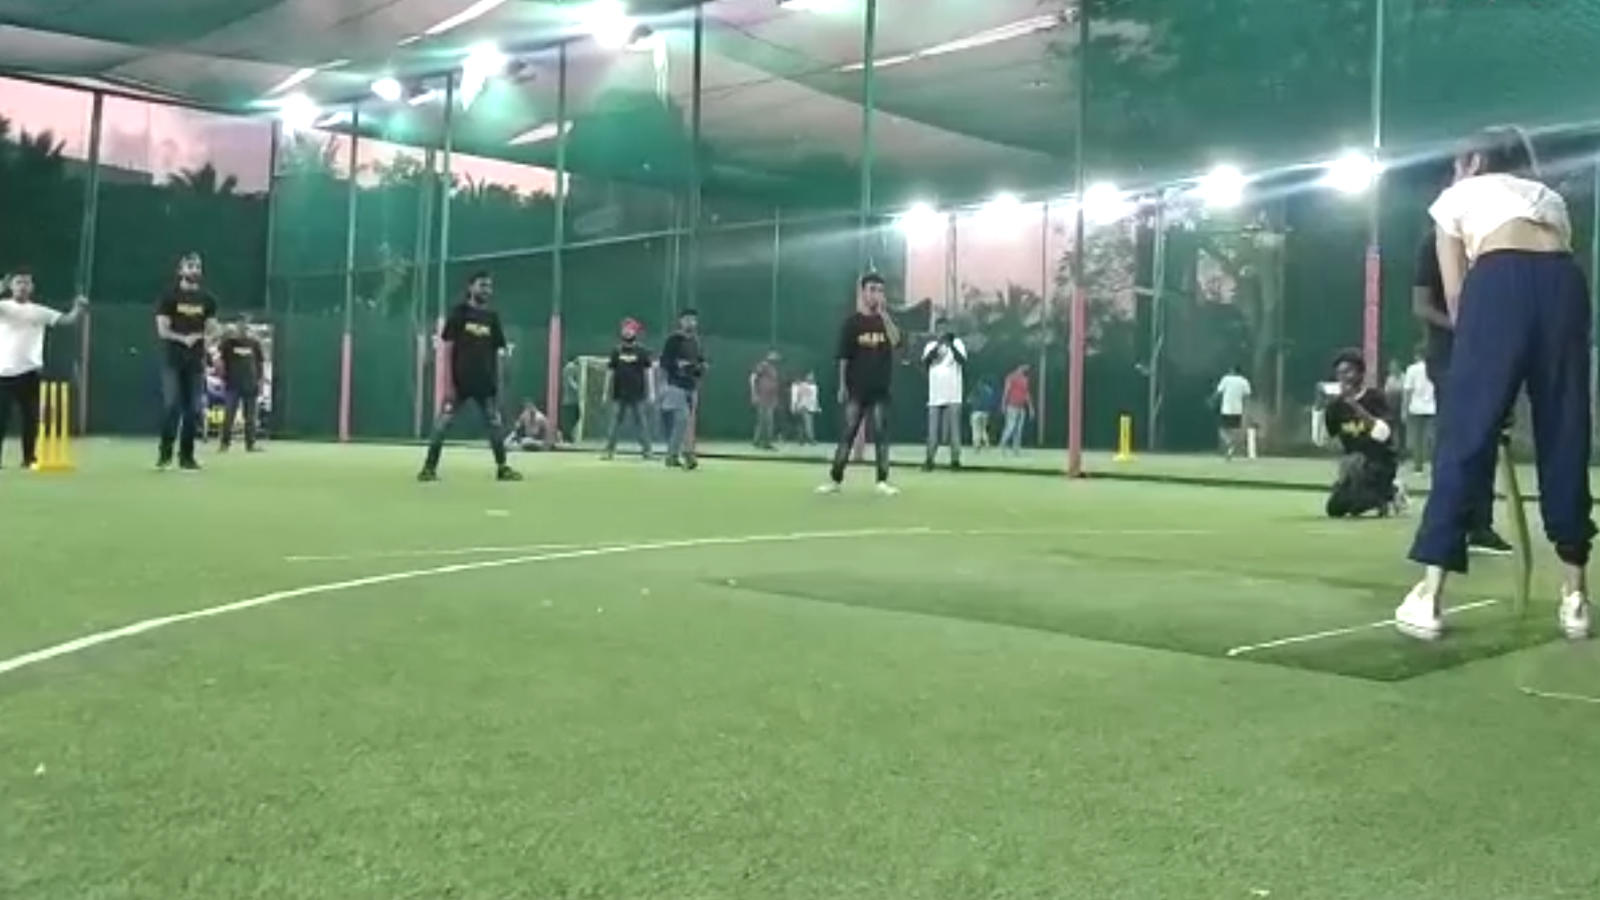 'Malaal' promotions: Debutantes Meezaan Jaffrey and Sharmin Sehgal play friendly cricket match